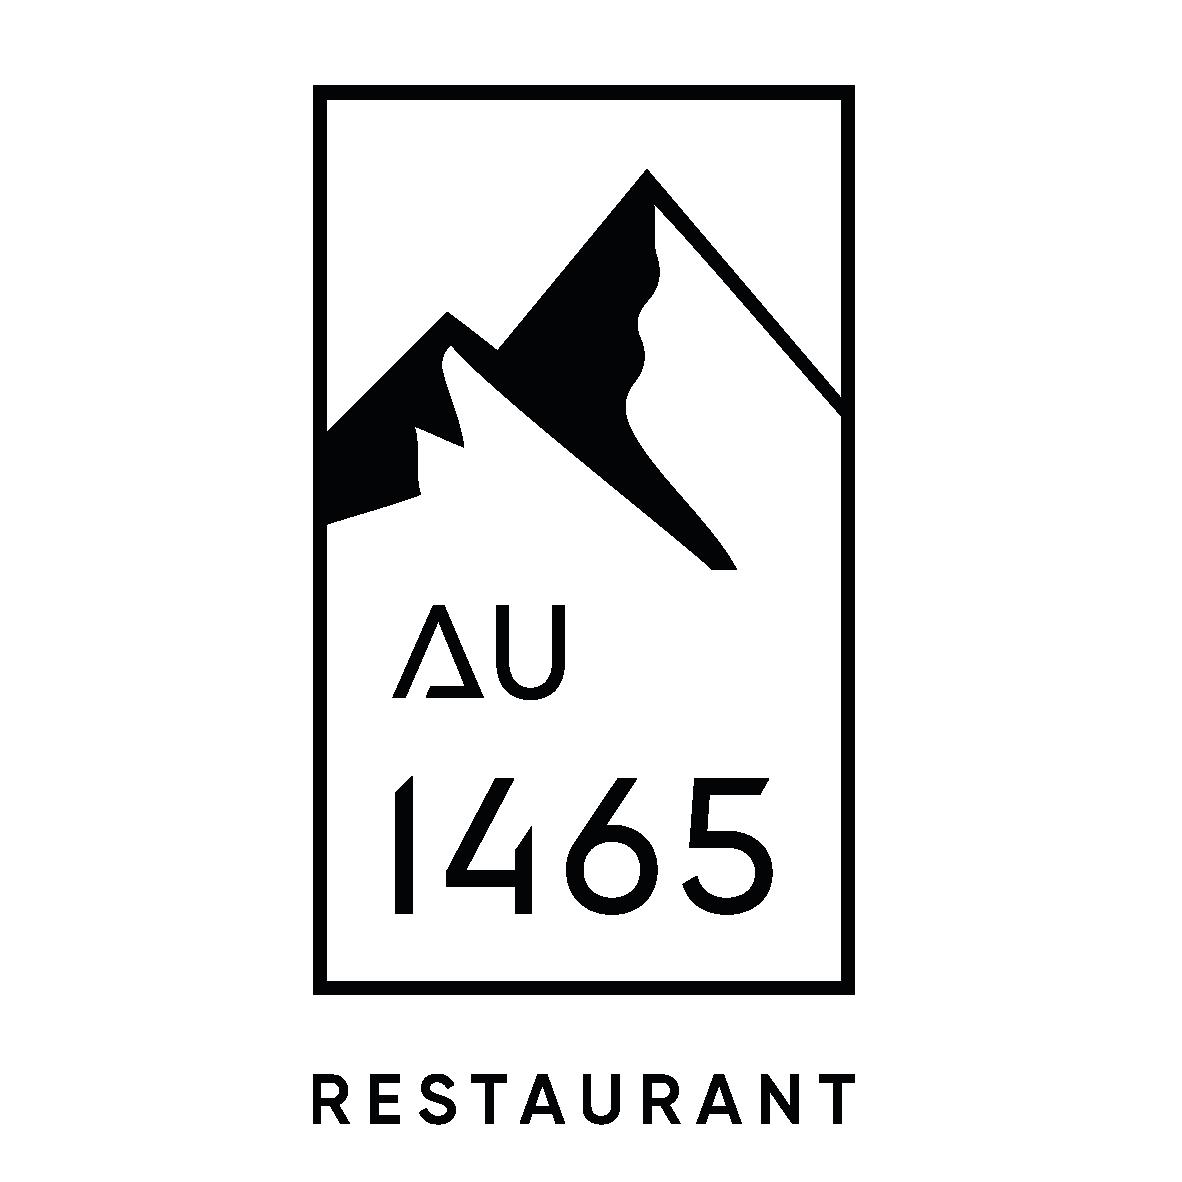 Au Club Alpin, Le 1465